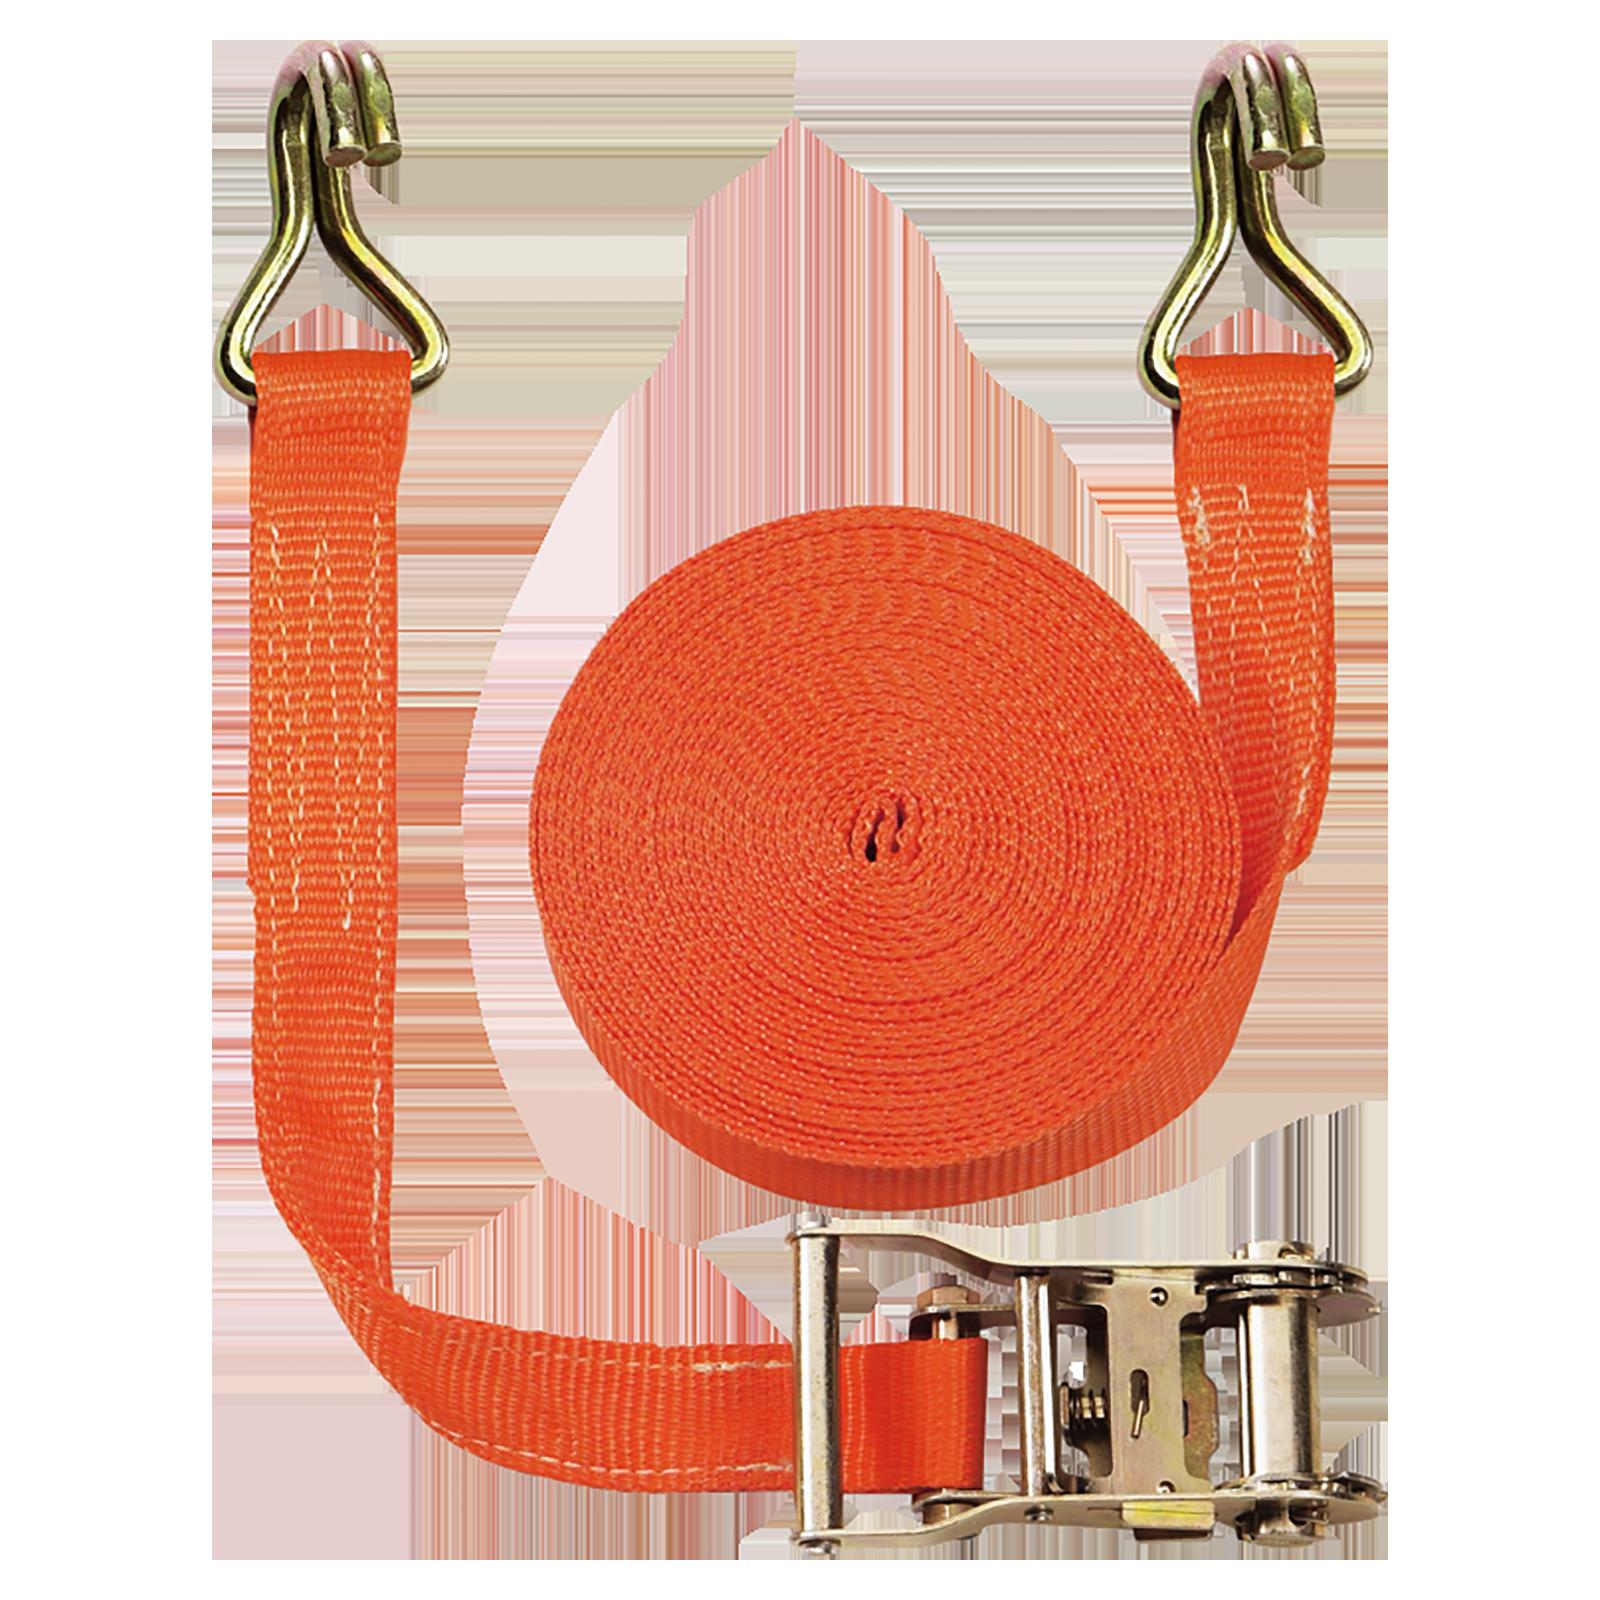 Lashing strap 2 parts, 2000 daN (kg), length 10m, width 35mm.